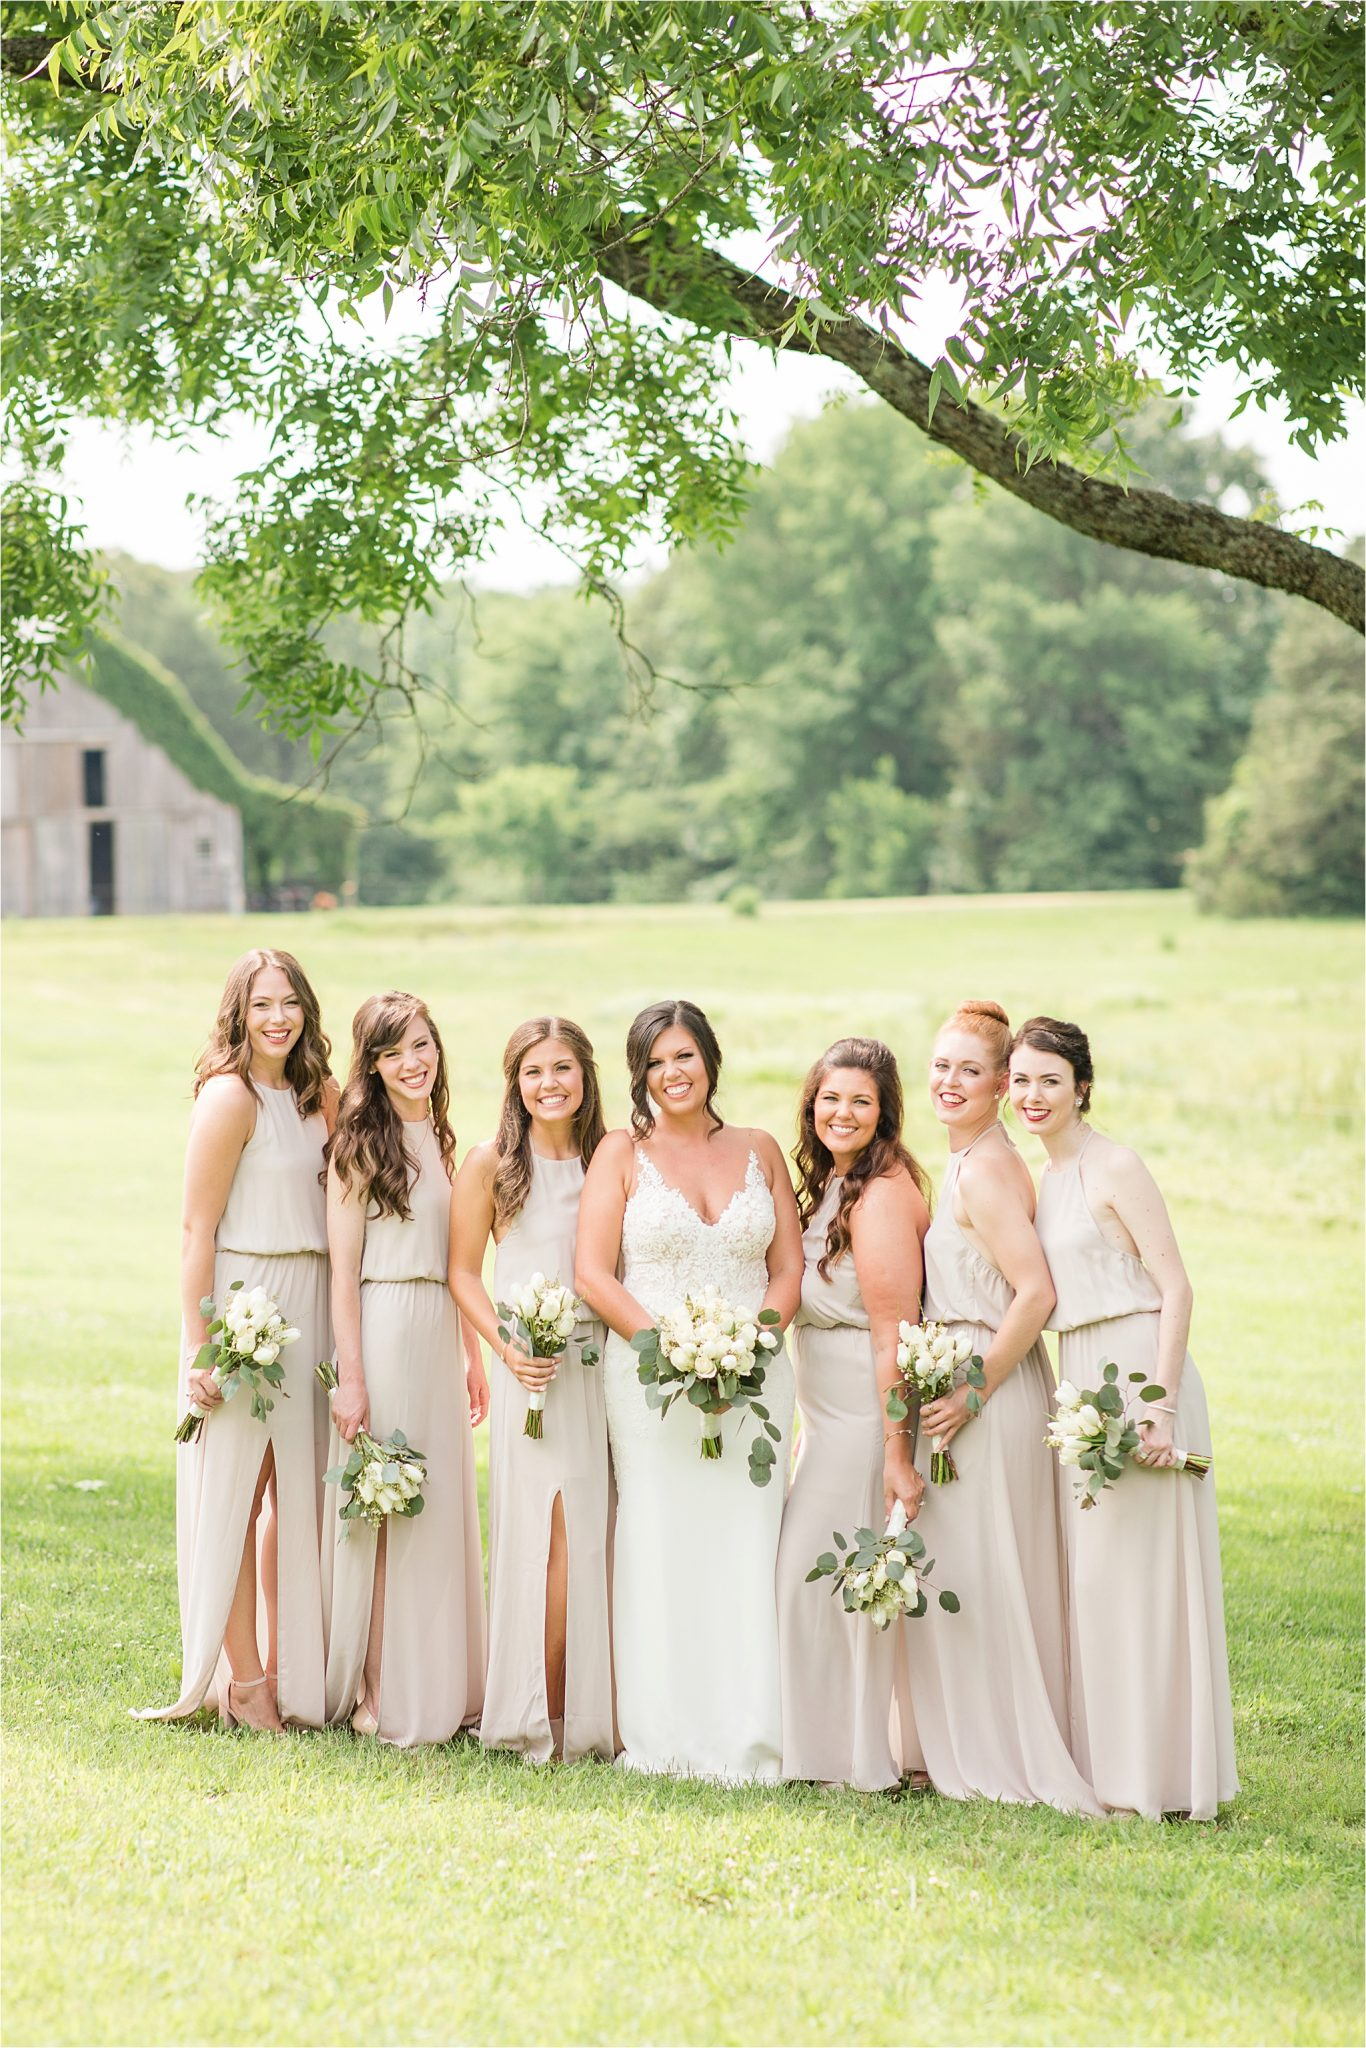 HHedge Farm Wedding, Alabama Wedding Photographer, Barn Wedding, Bride and bridesmaids, Neutrals